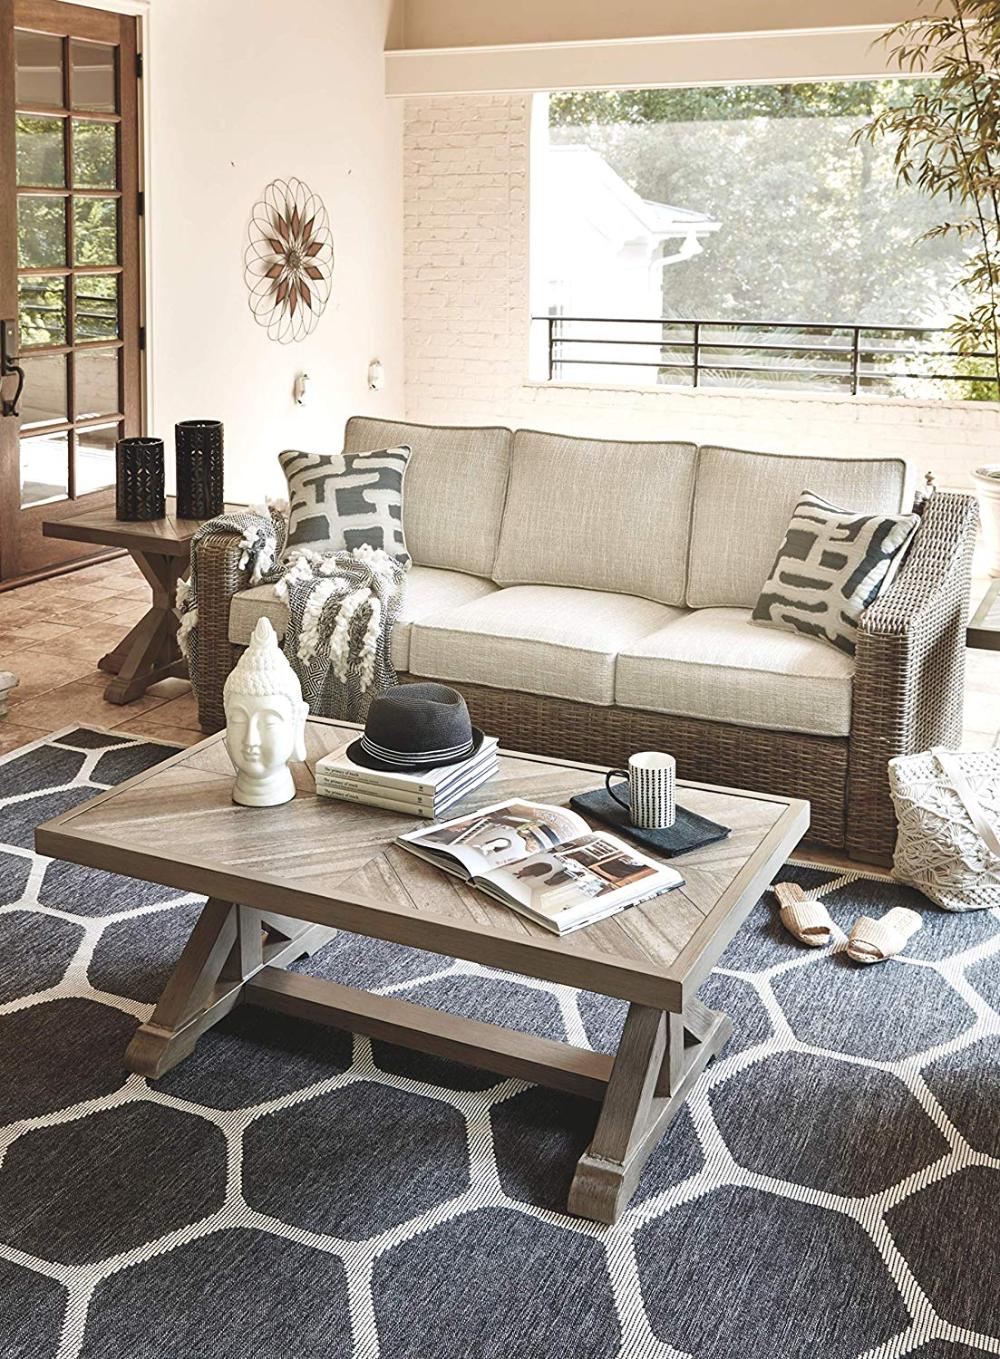 Amazon.com: Signature Design by Ashley - Beachcroft ... on Beachcroft Beige Outdoor Living Room Set id=58838